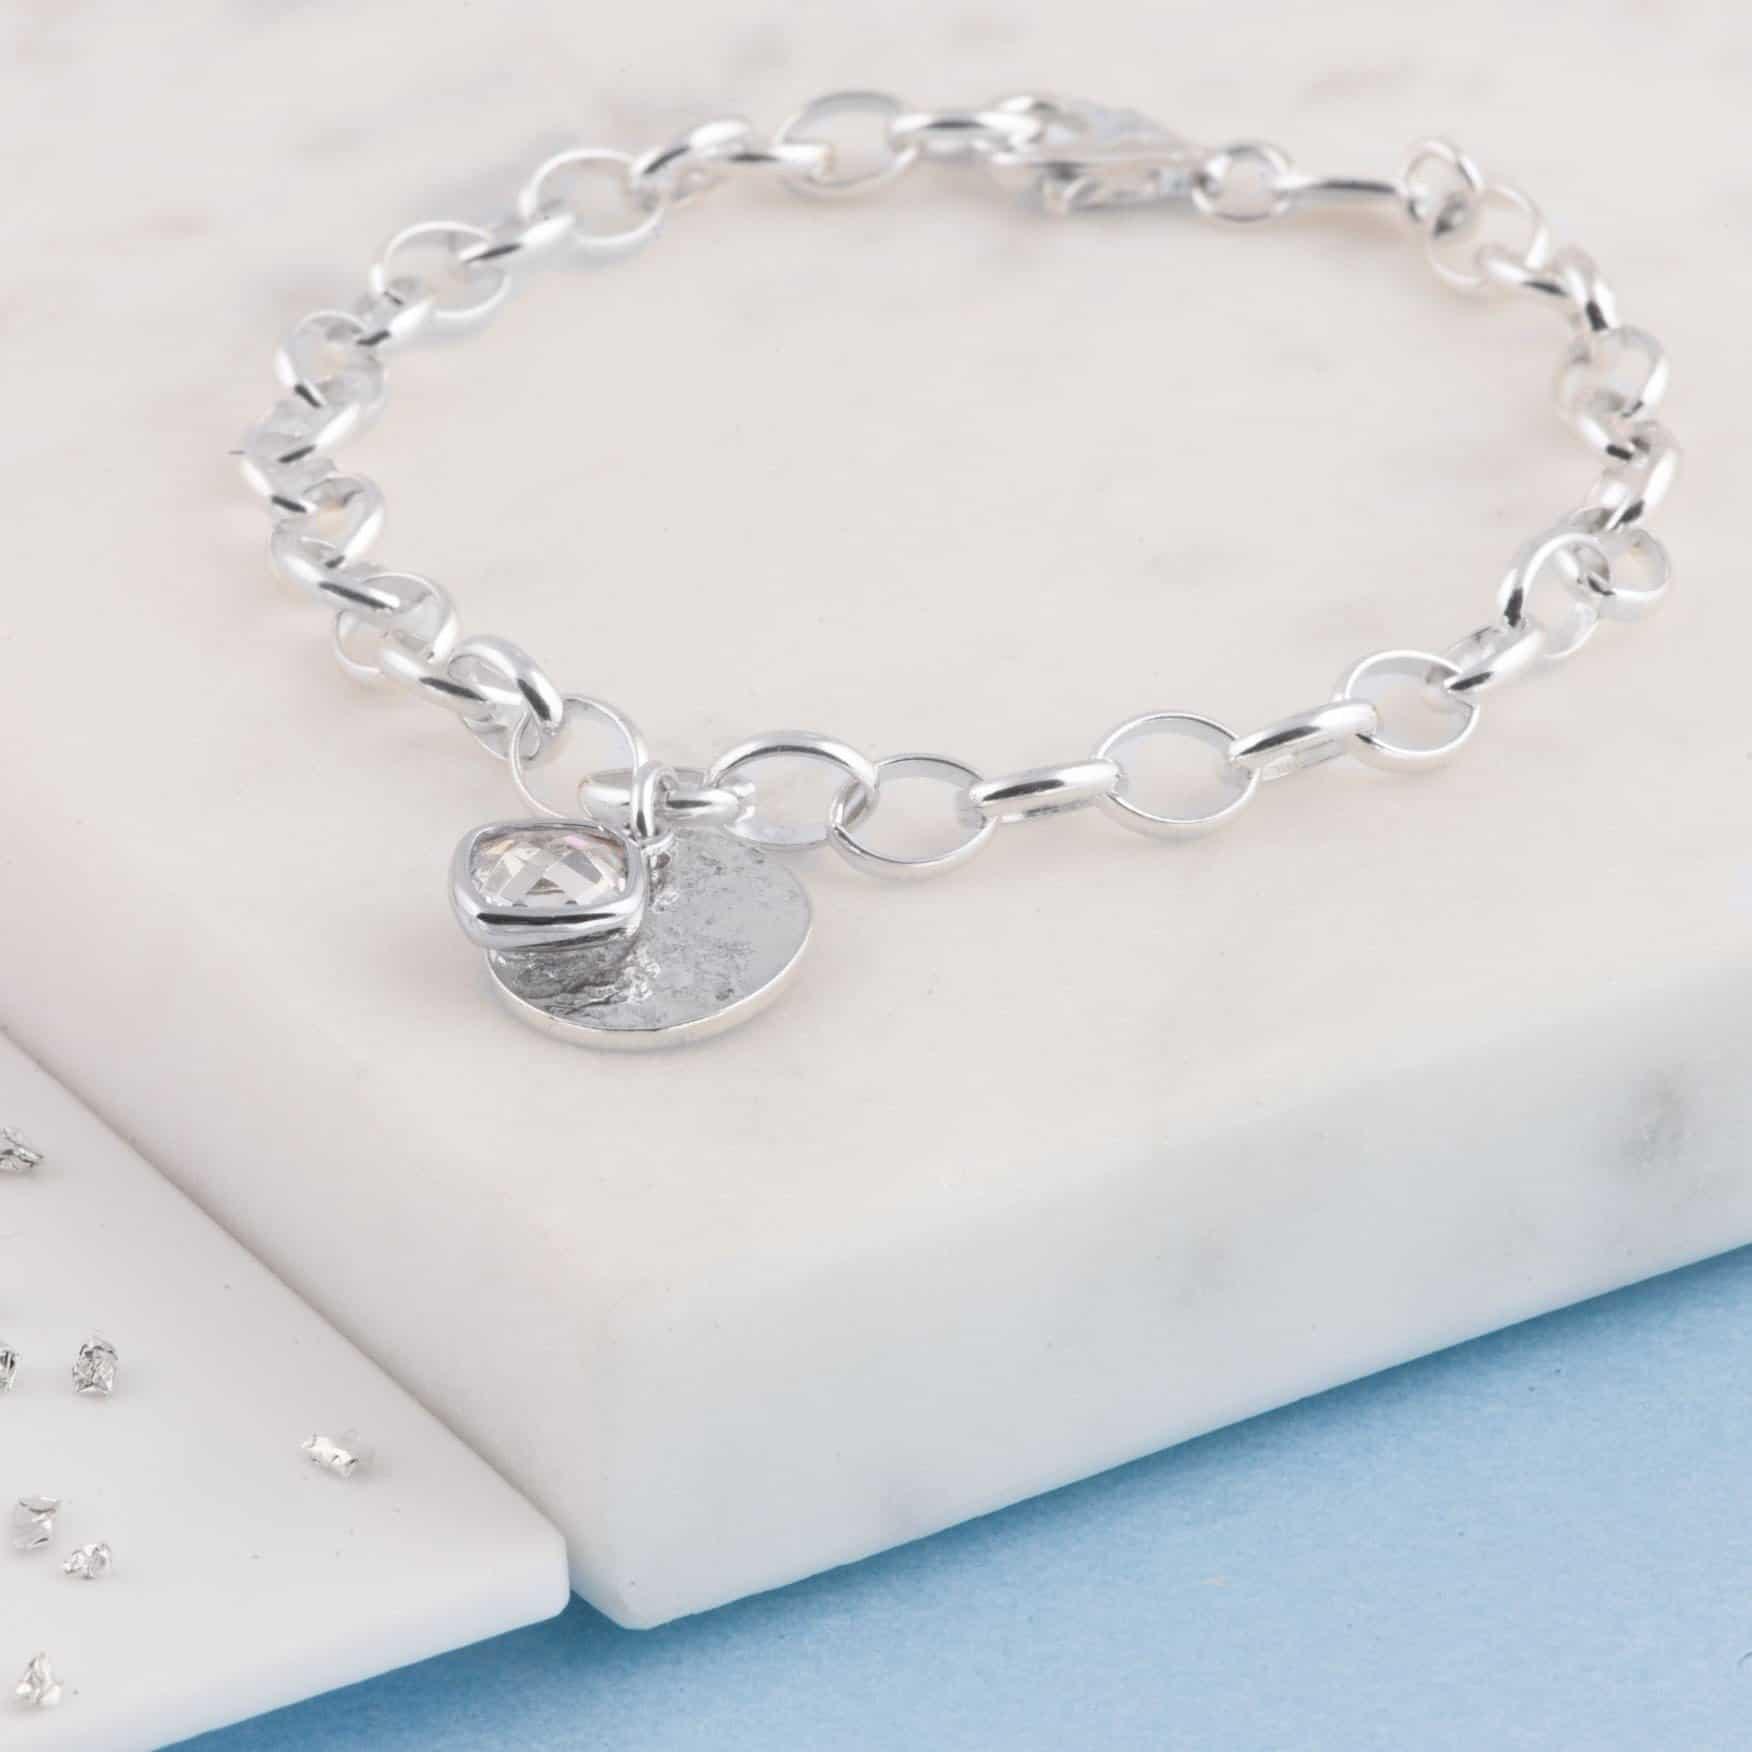 Memorial Belcher Chain Bracelet, Ashes Imprint Disc, Sterling Silver